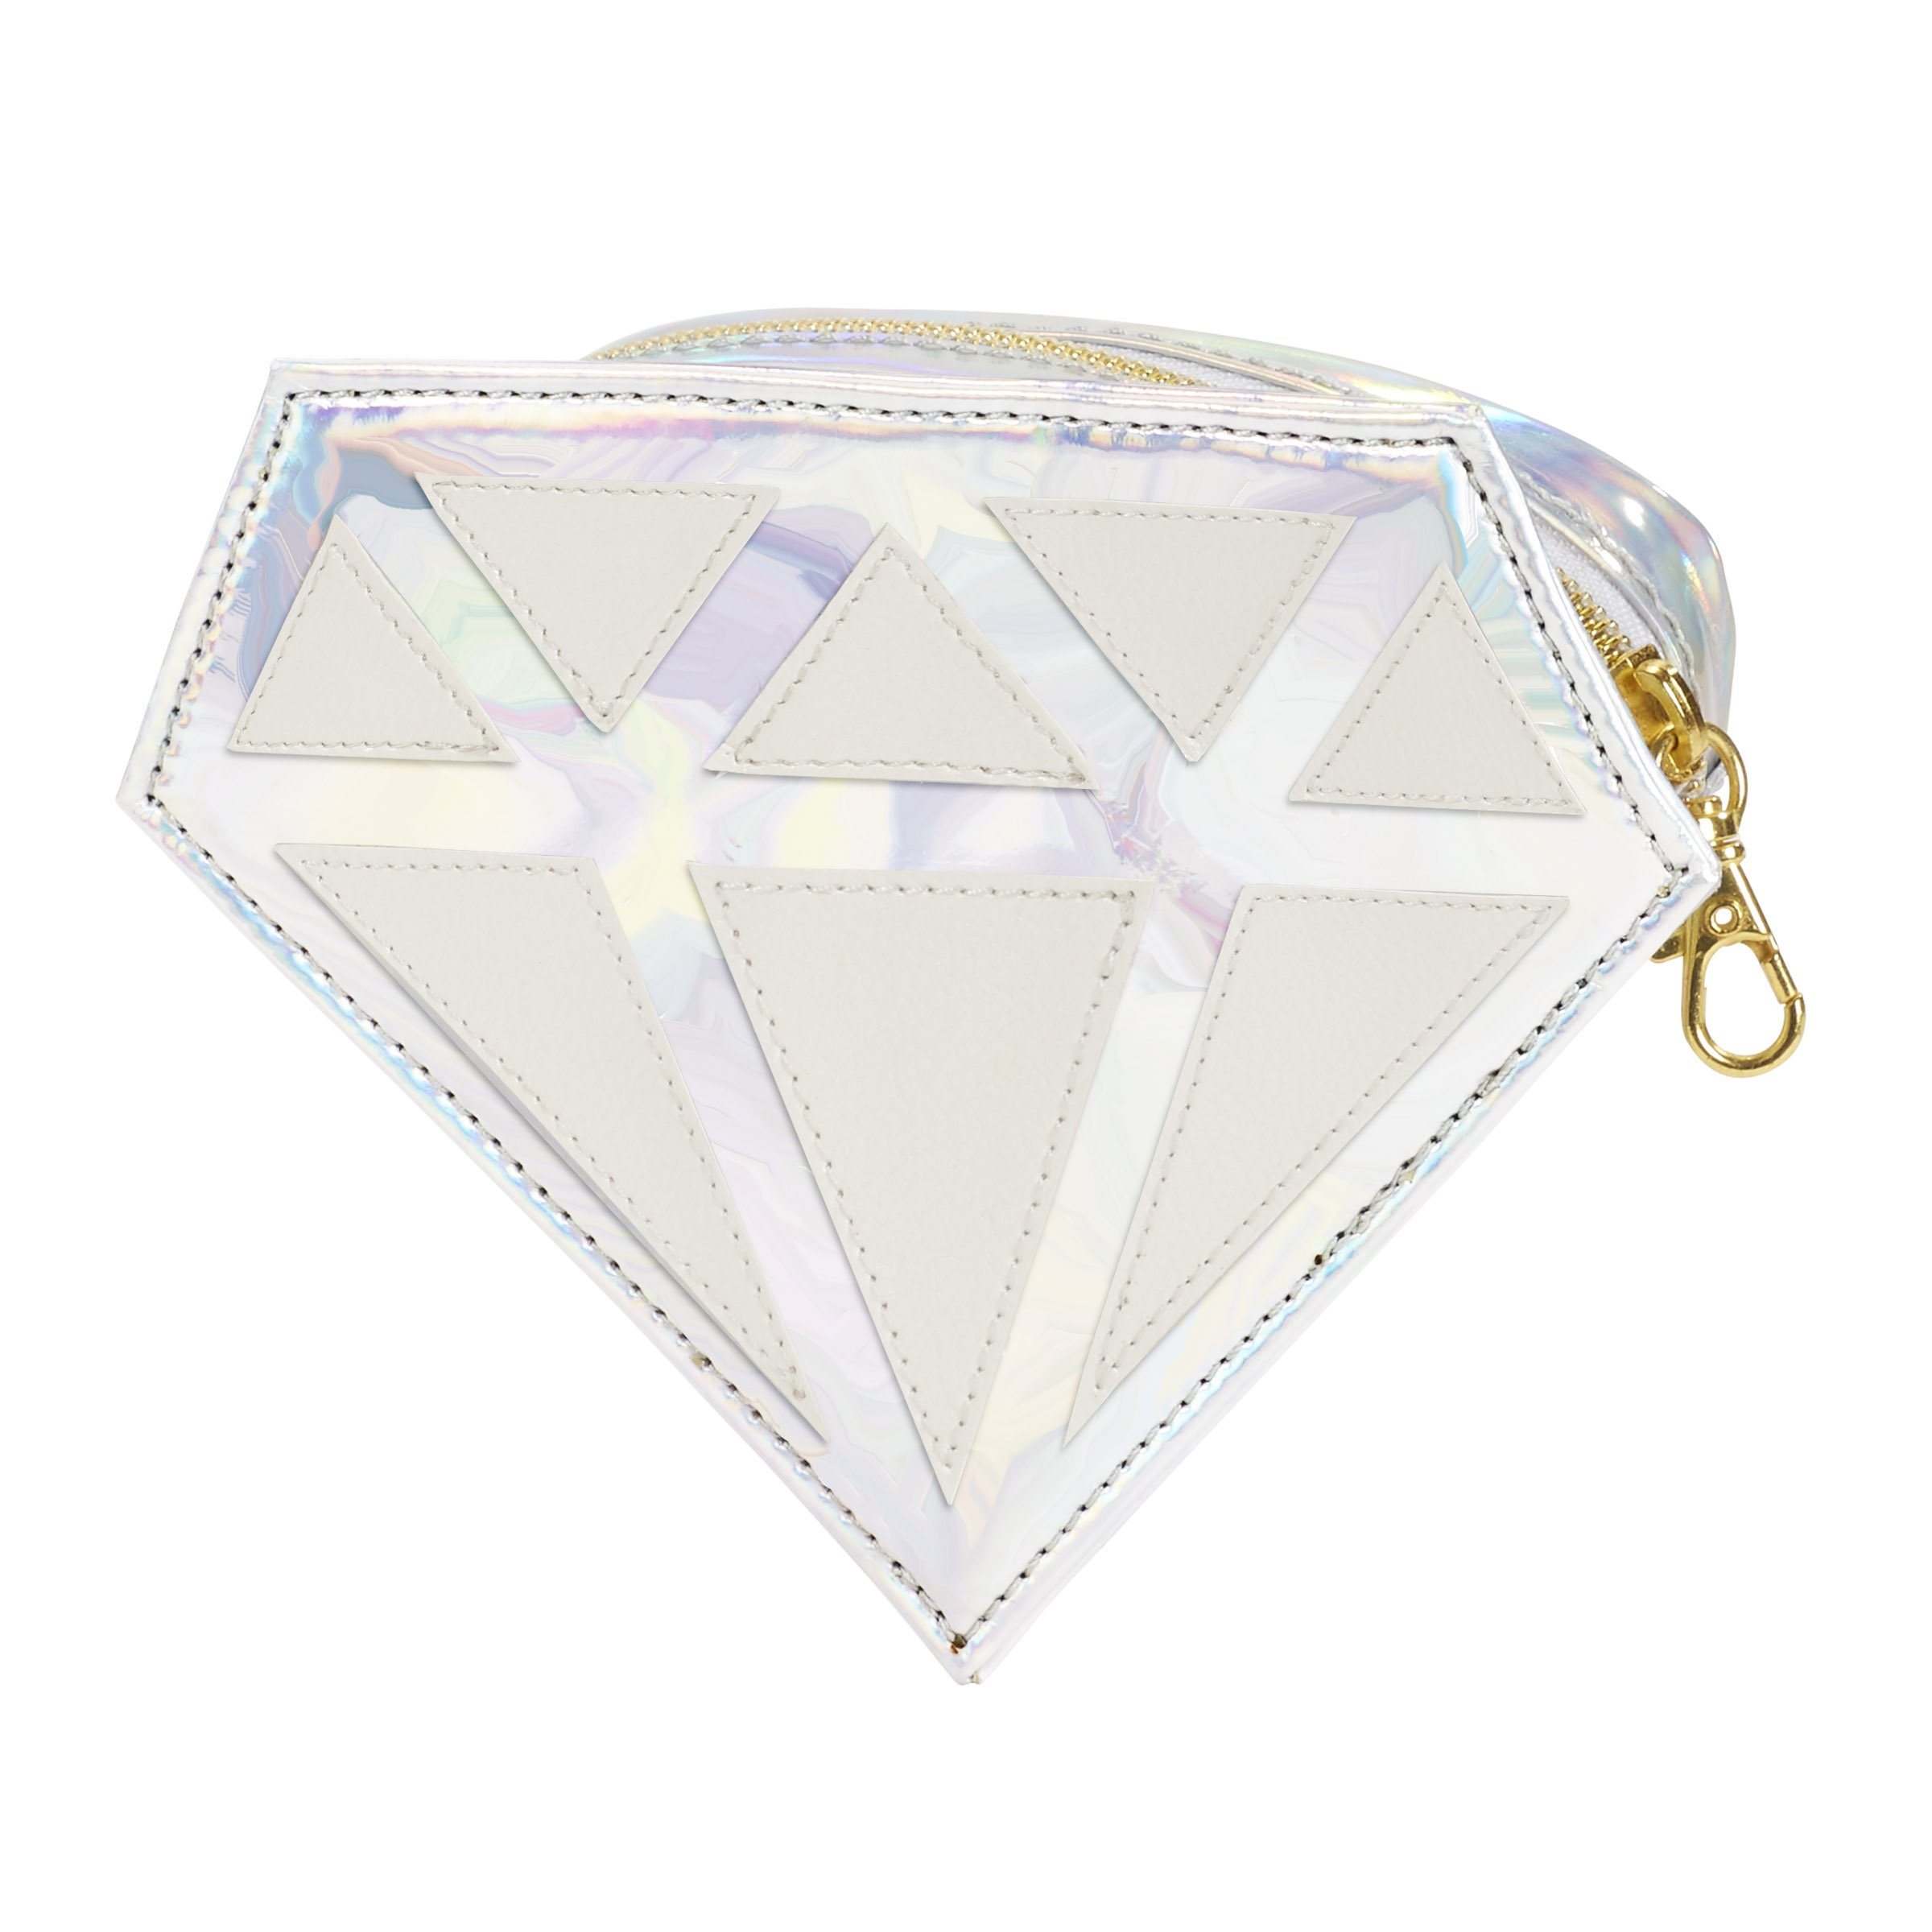 C.R. Gibson Women's Shaped Zippered Travel Or Bridal Mini Emergency Kit, 24pc, Diamond